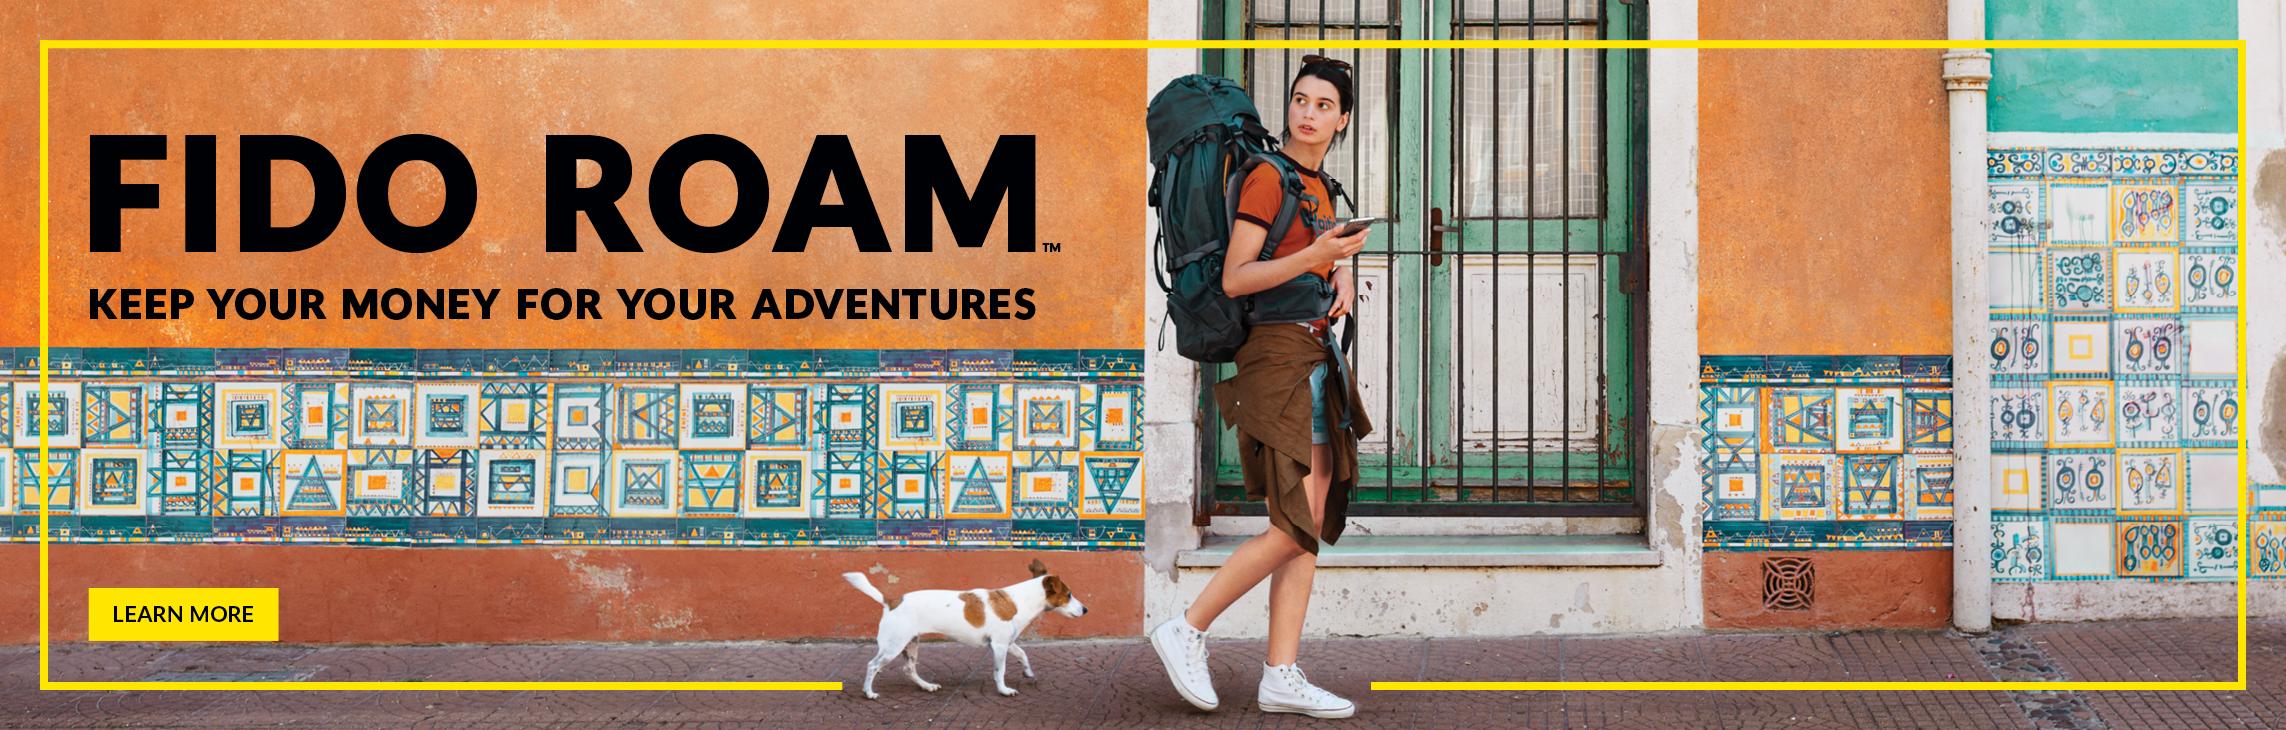 Fido Roam - Keep your money for your adventures